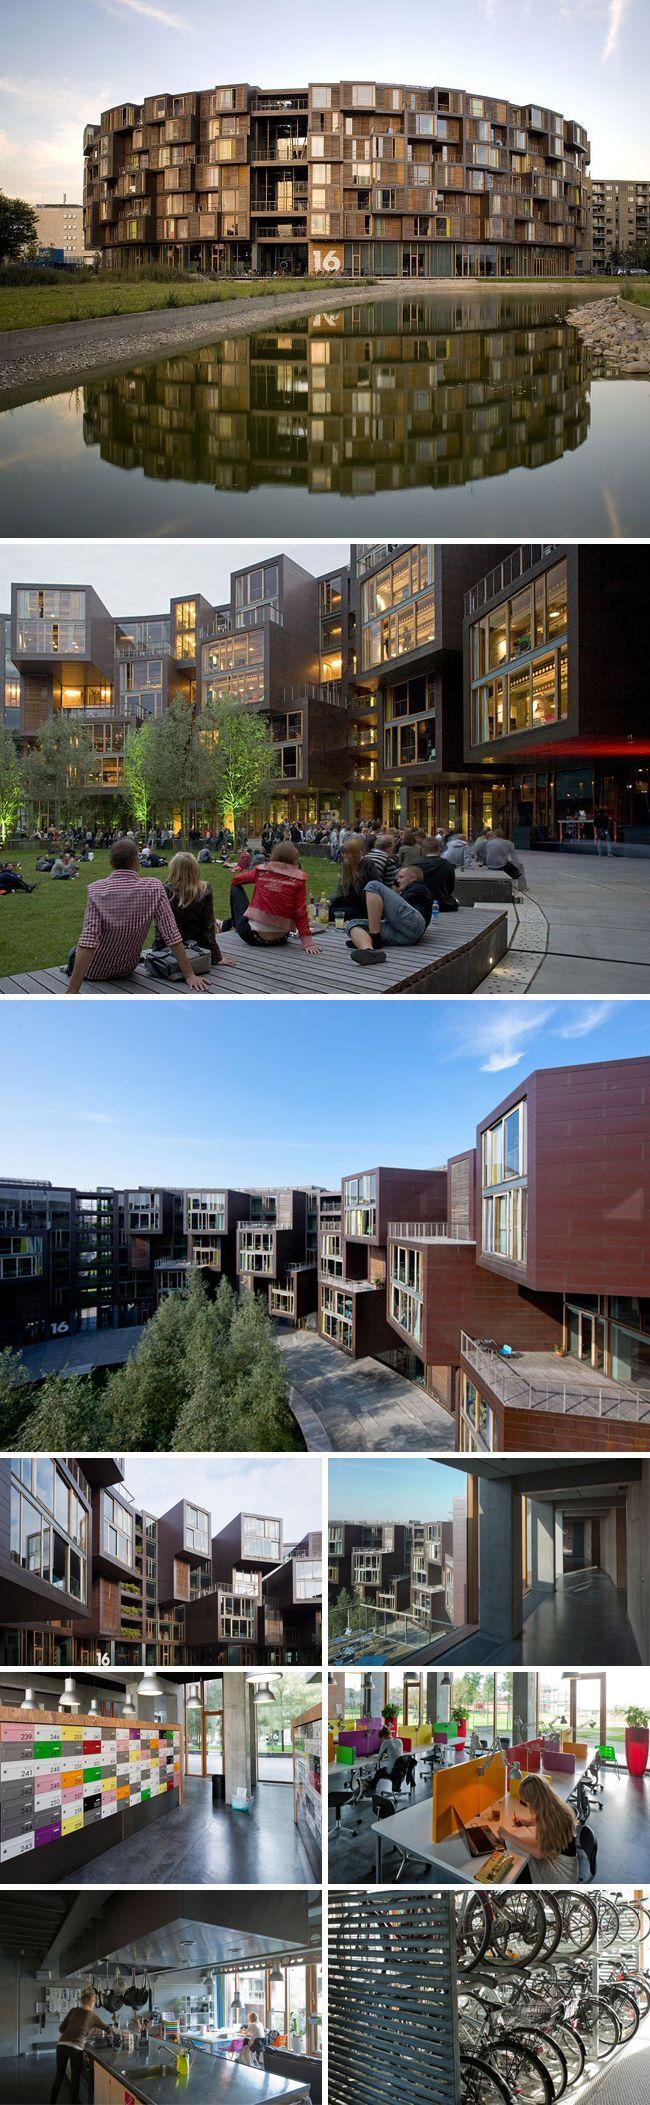 Tietgenkollegiet (English: Tietgen Student Hall) / Logement pour étudiants / Lundgaard & Tranberg / Copenhague, Danemark